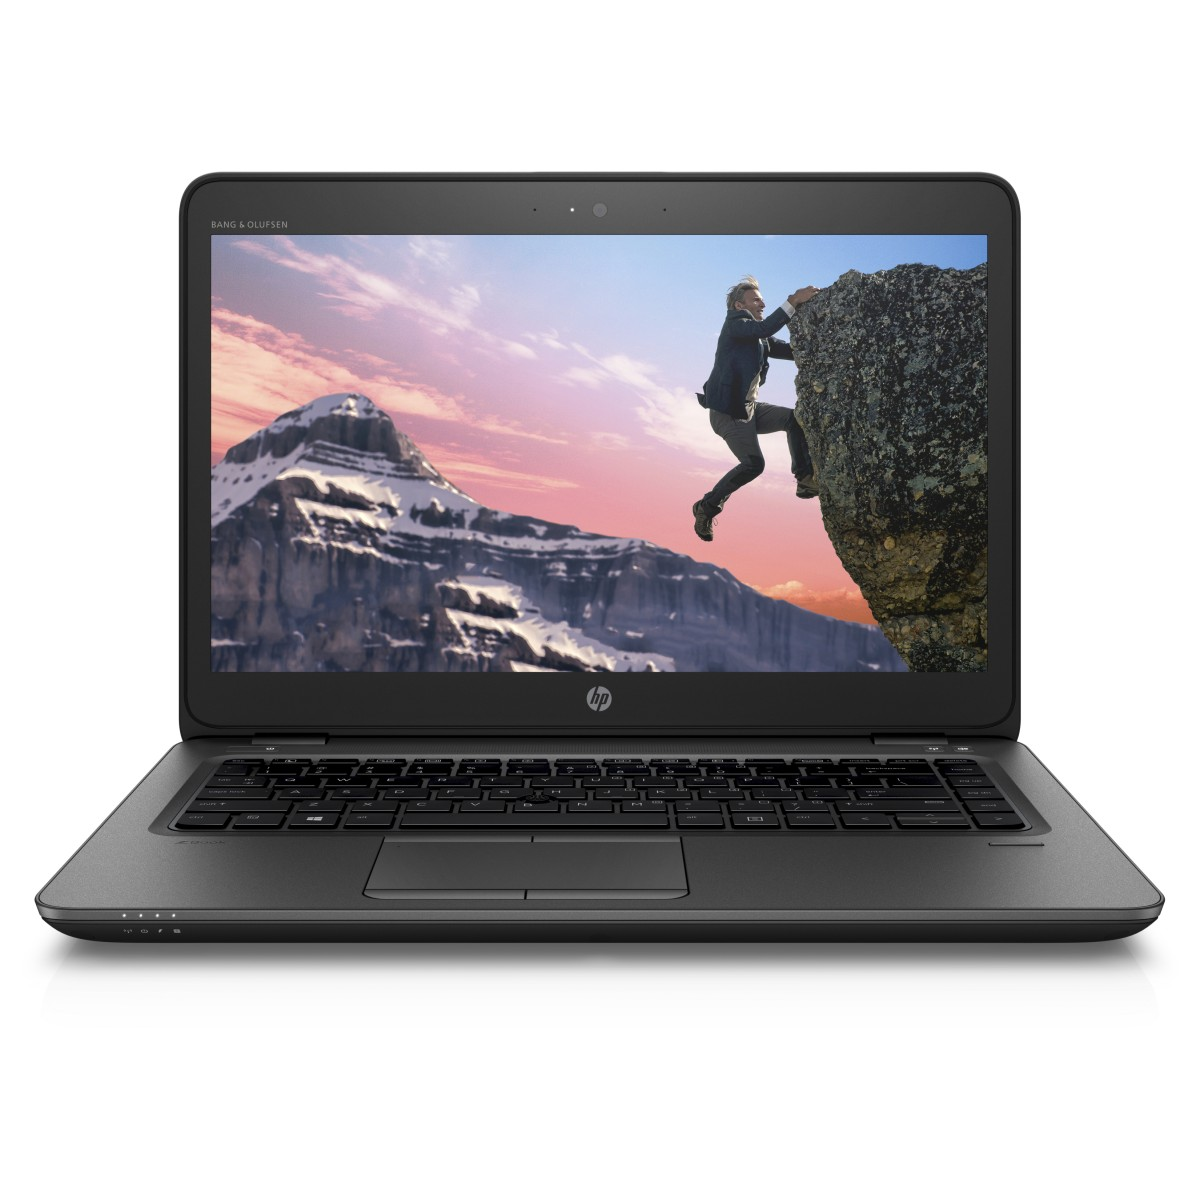 HP ZBook 14u G4 HD+/i5-7200U/8/500/AMD+Intel HD/VGA/HDMI/TB/RJ45/WIFI/BT/4G/MCR/FPR/3RServis/W10P